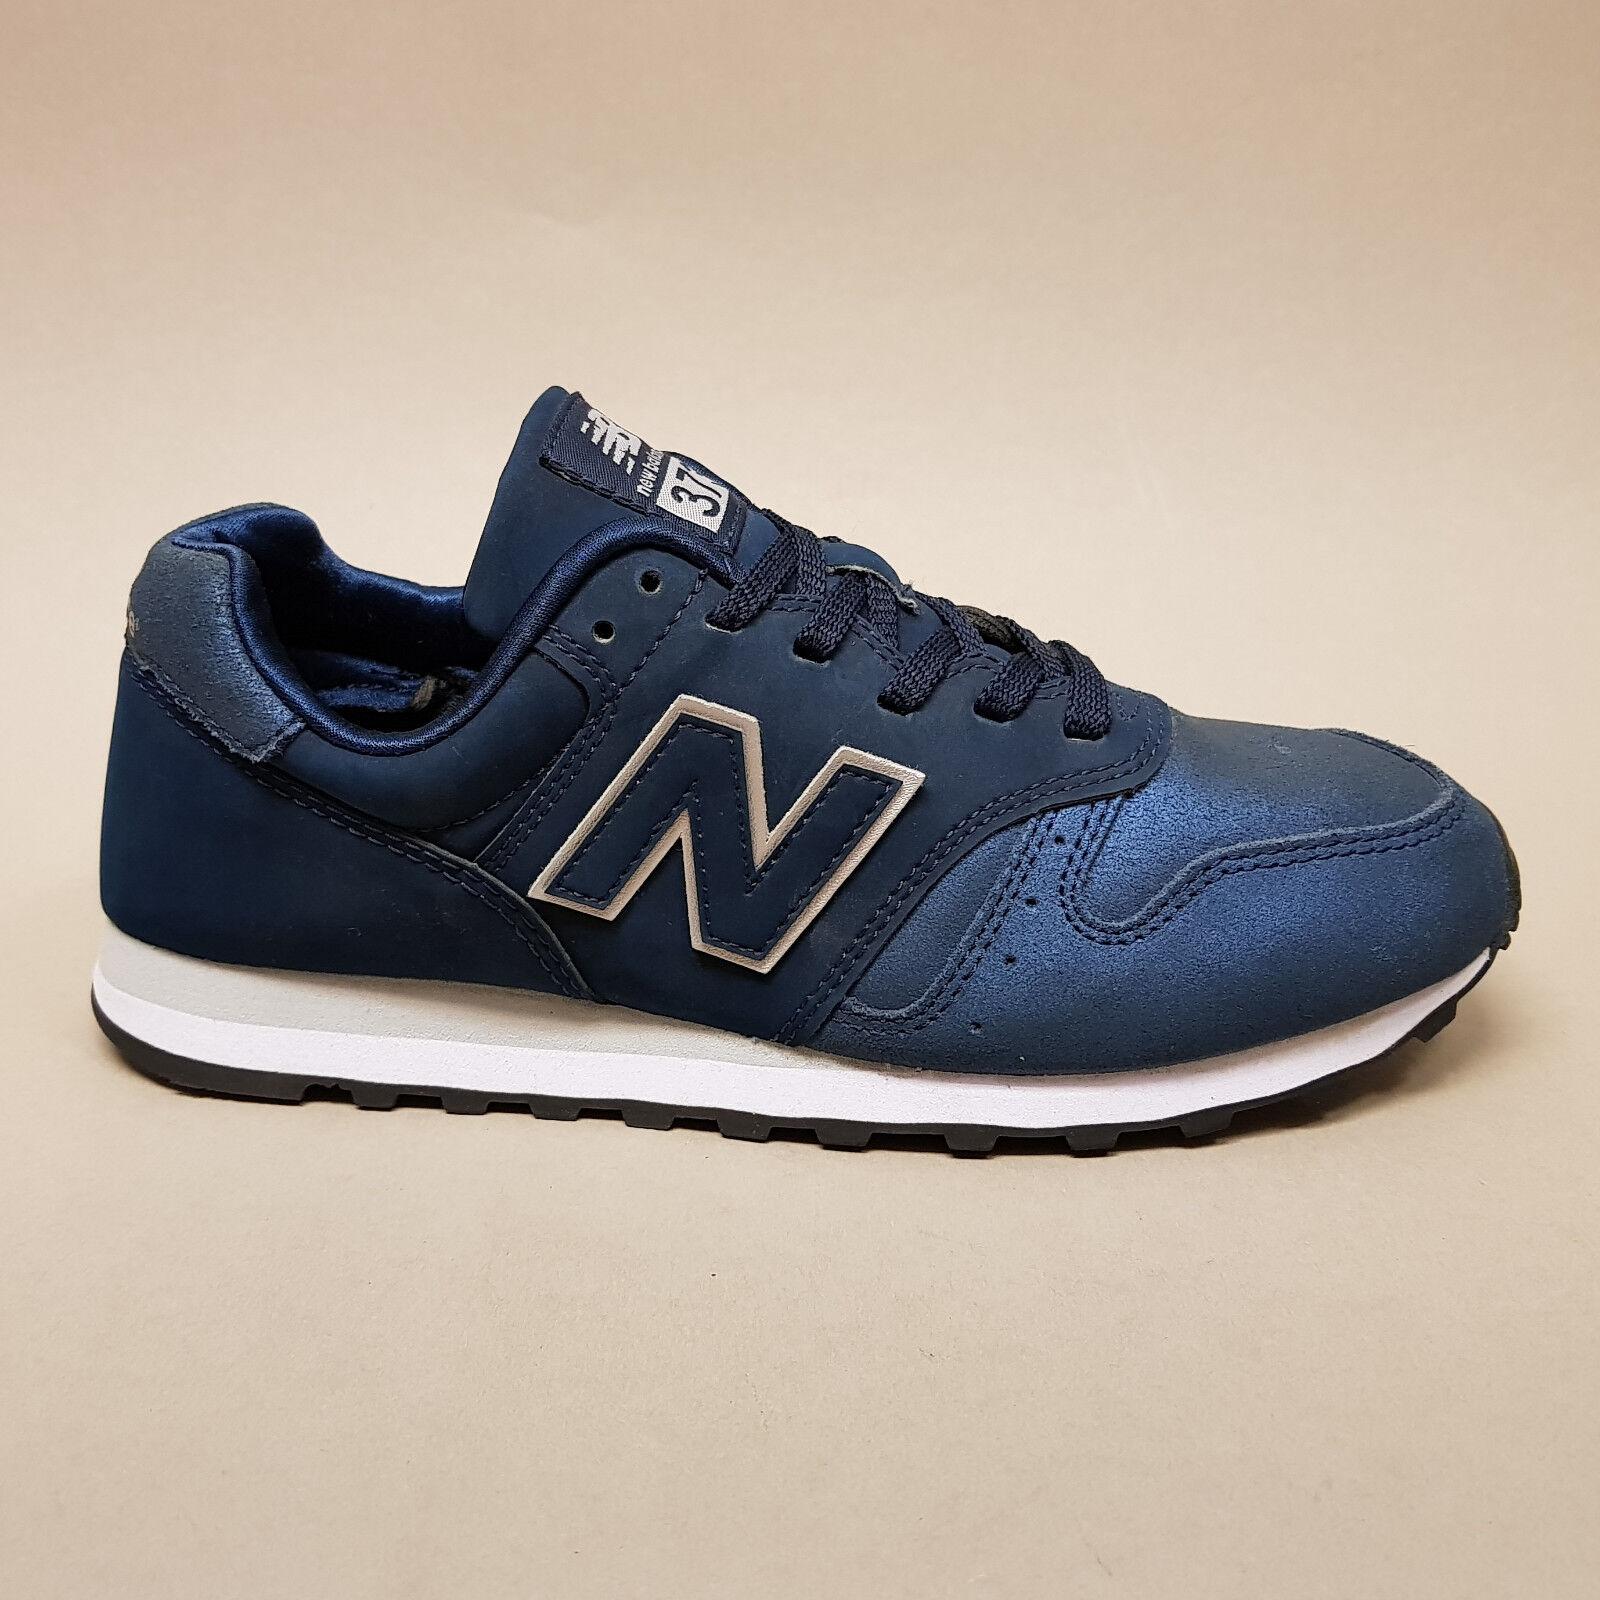 New Balance Classics WL373NS Navy Turnschuhe Sneakers blau metallic Leder Gr. 39